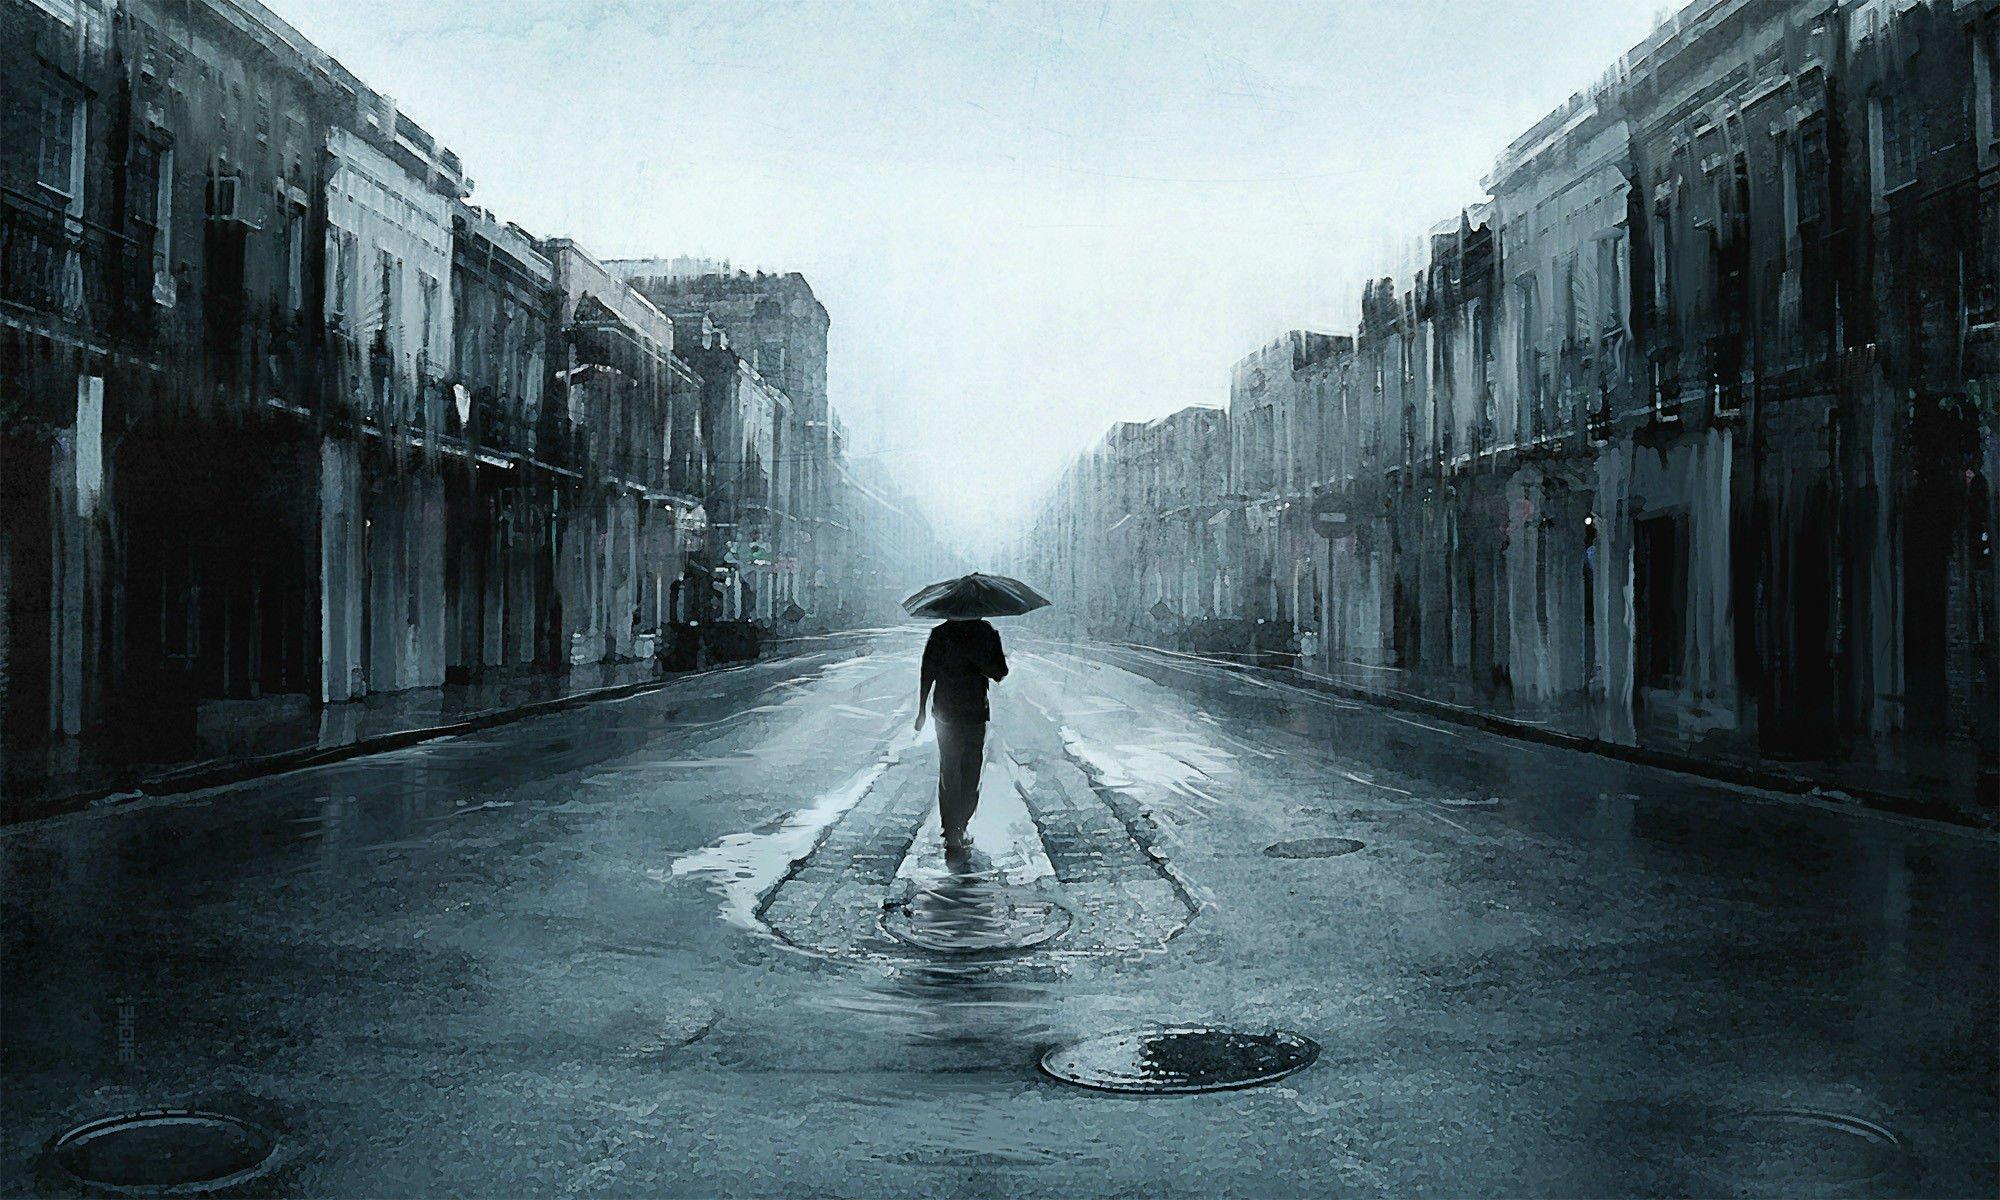 2000x1200 px dark depression love mood people rain sad sorrow 1765409